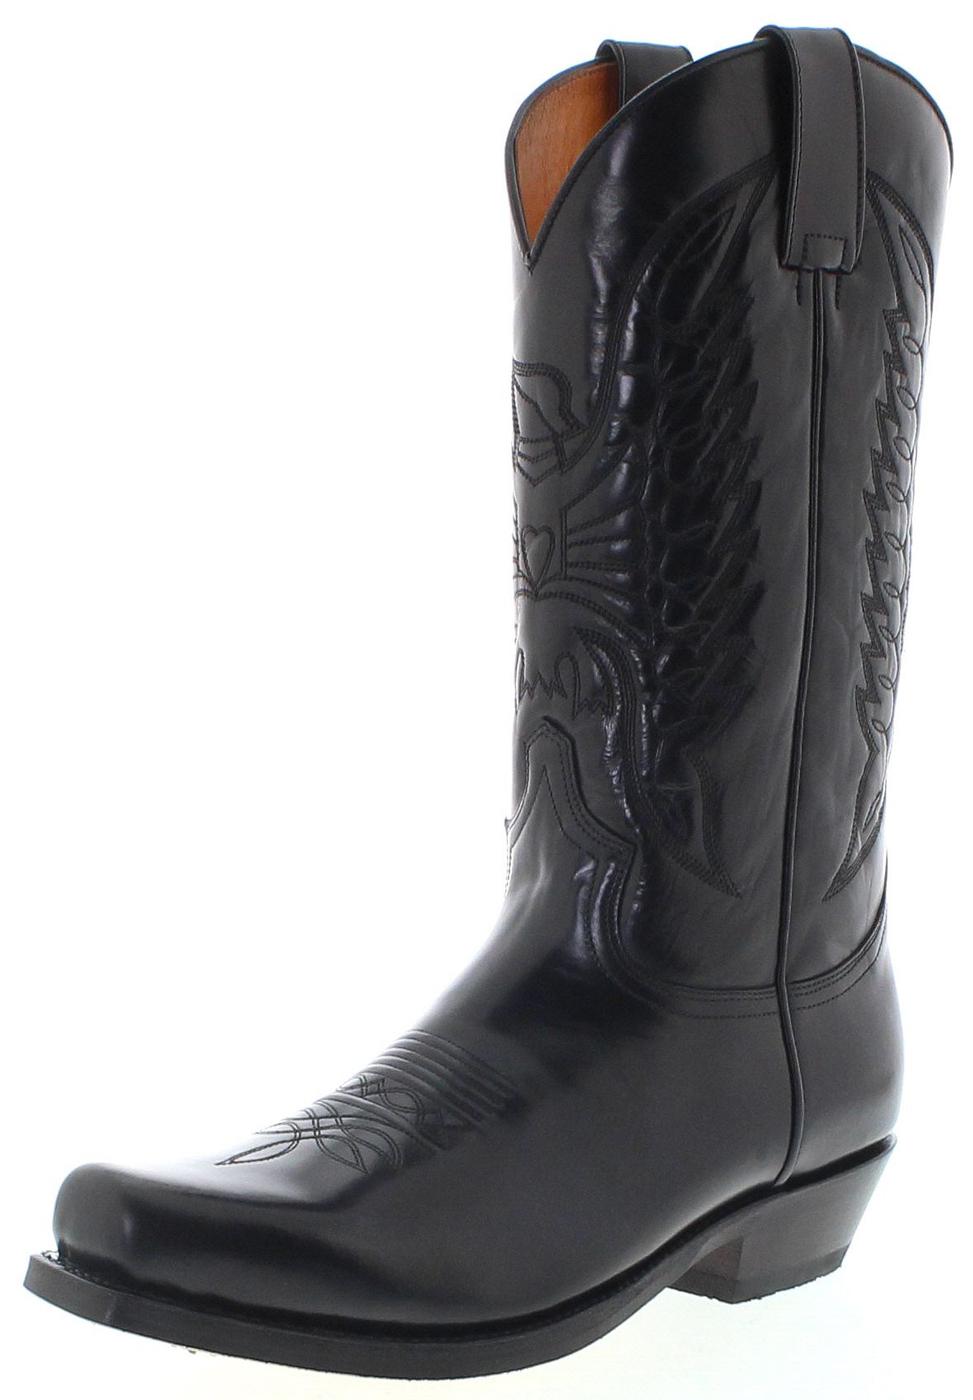 Sendra Boots 2073 58 Negro Westernstiefel - schwarz